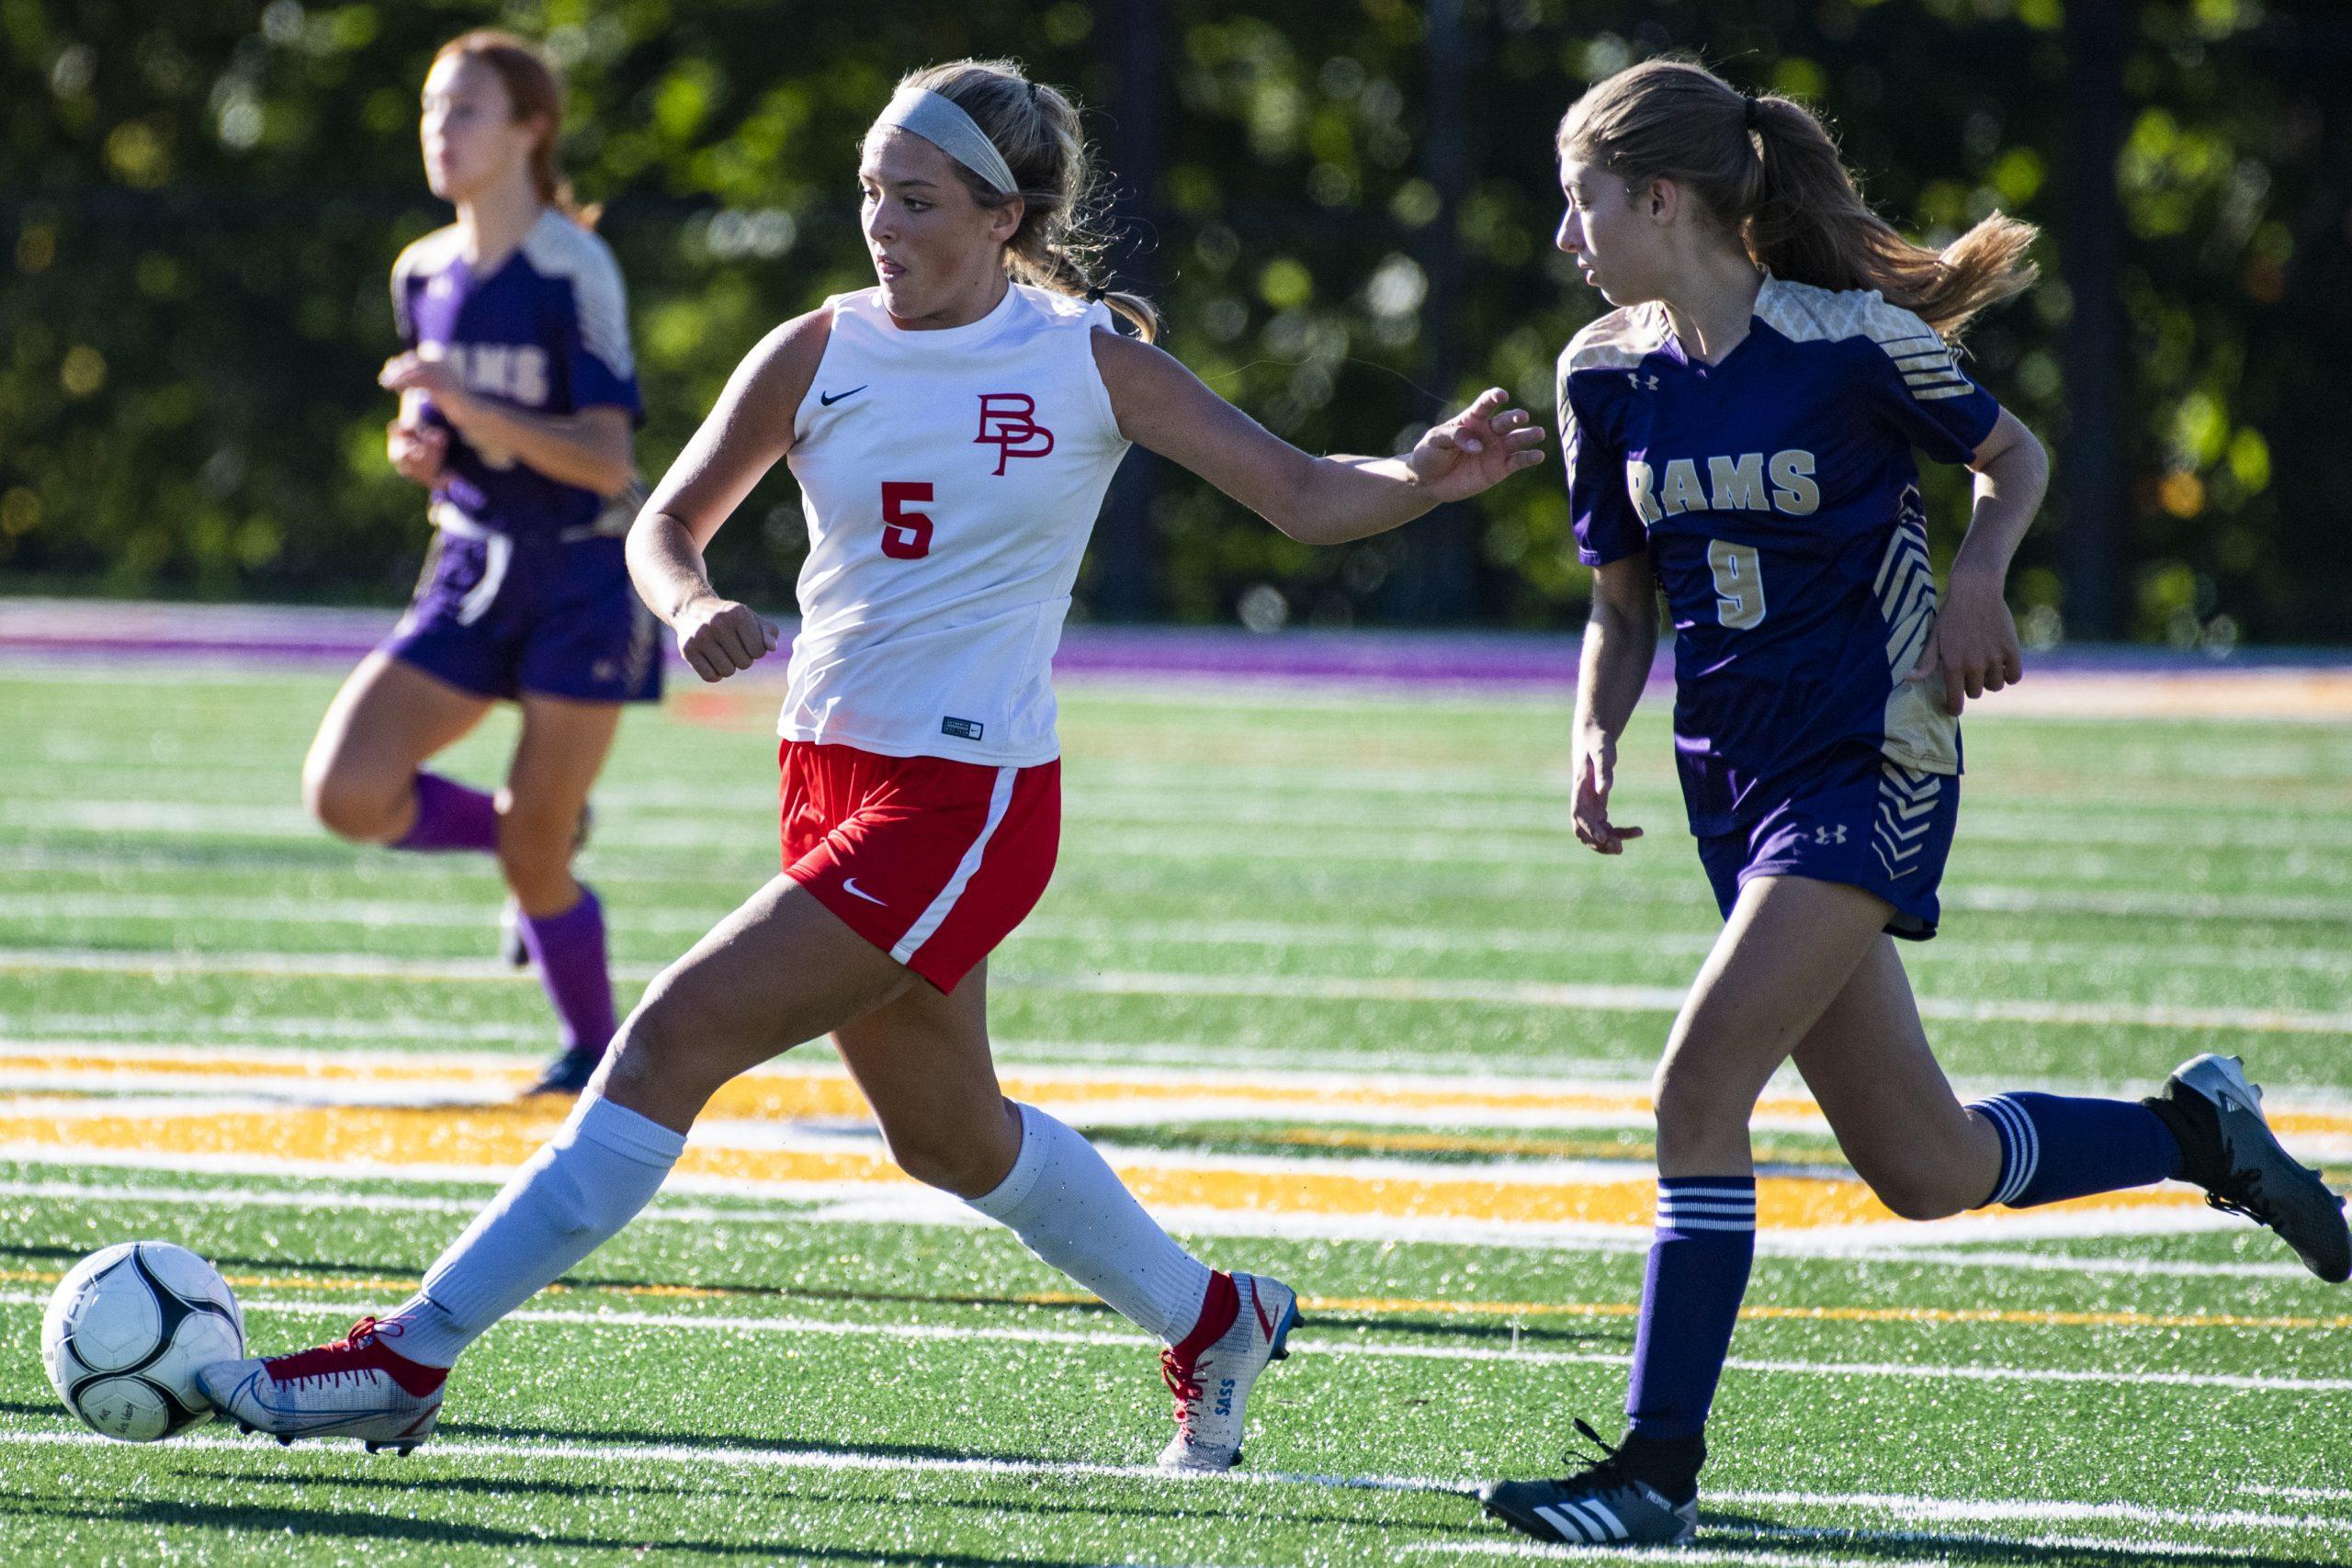 High schools: Sassanella's sparks Broadalbin-Perth girls' soccer to win